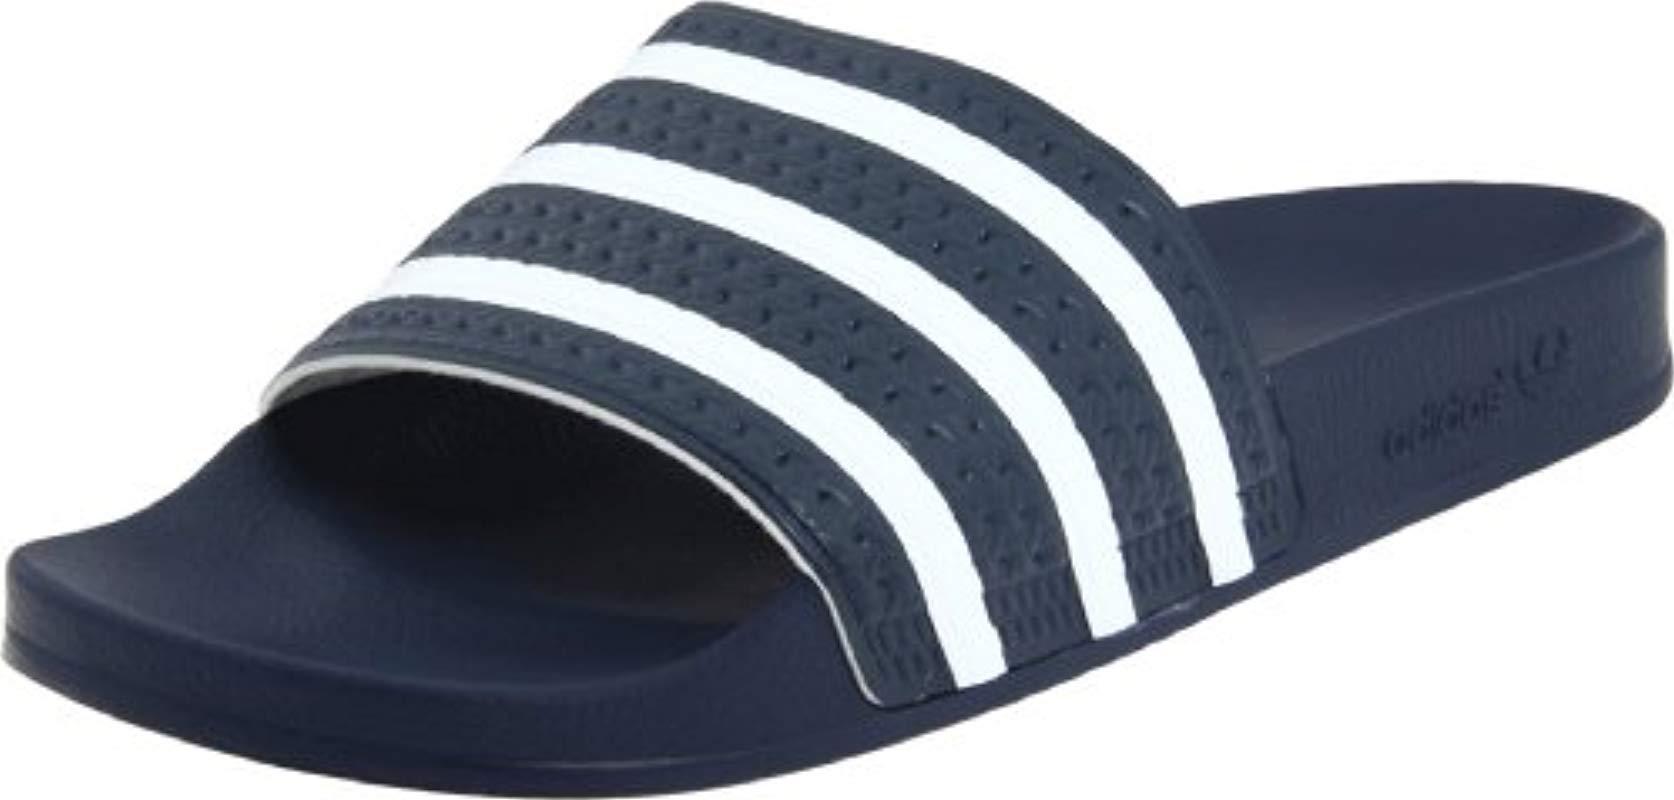 d715bae8d629bf Lyst - Adidas Originals Adidas Adilette Slide Sandal in Blue for Men